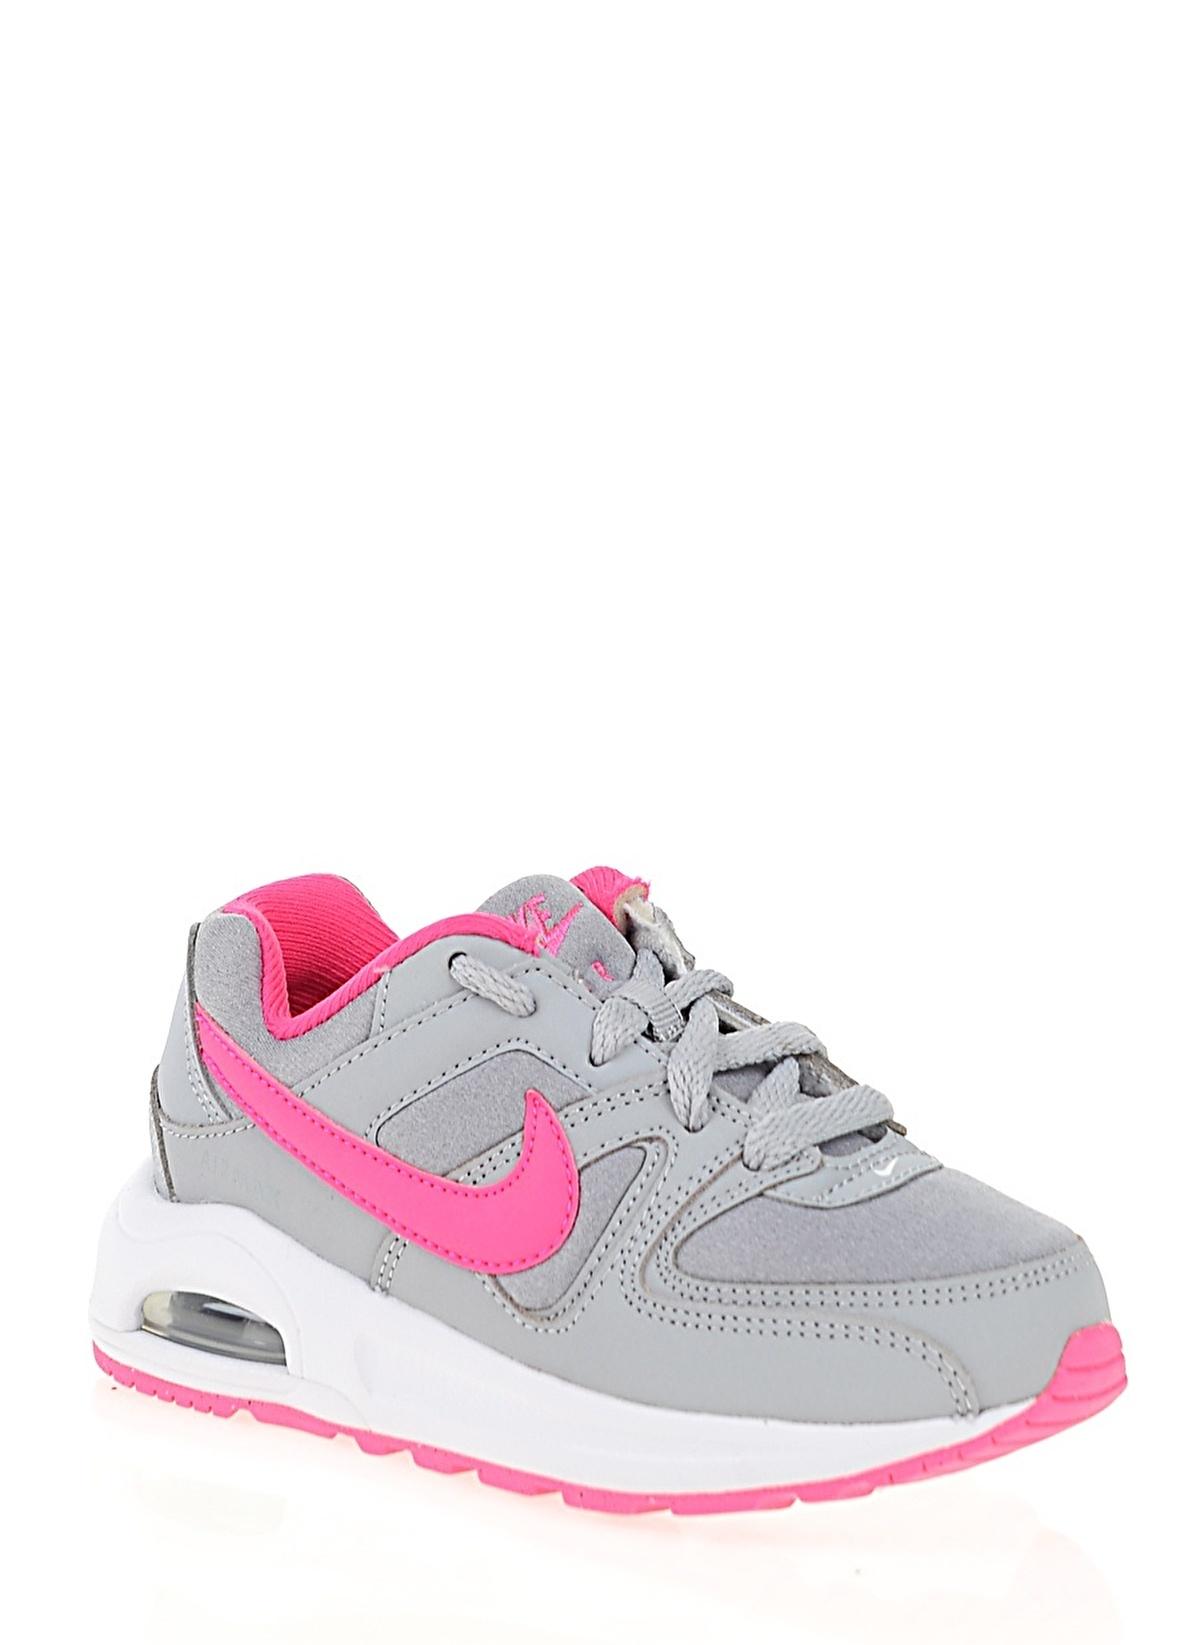 new product b7355 51915 Nike Nıke Aır Max Command Flex (Ps) Siyah ...